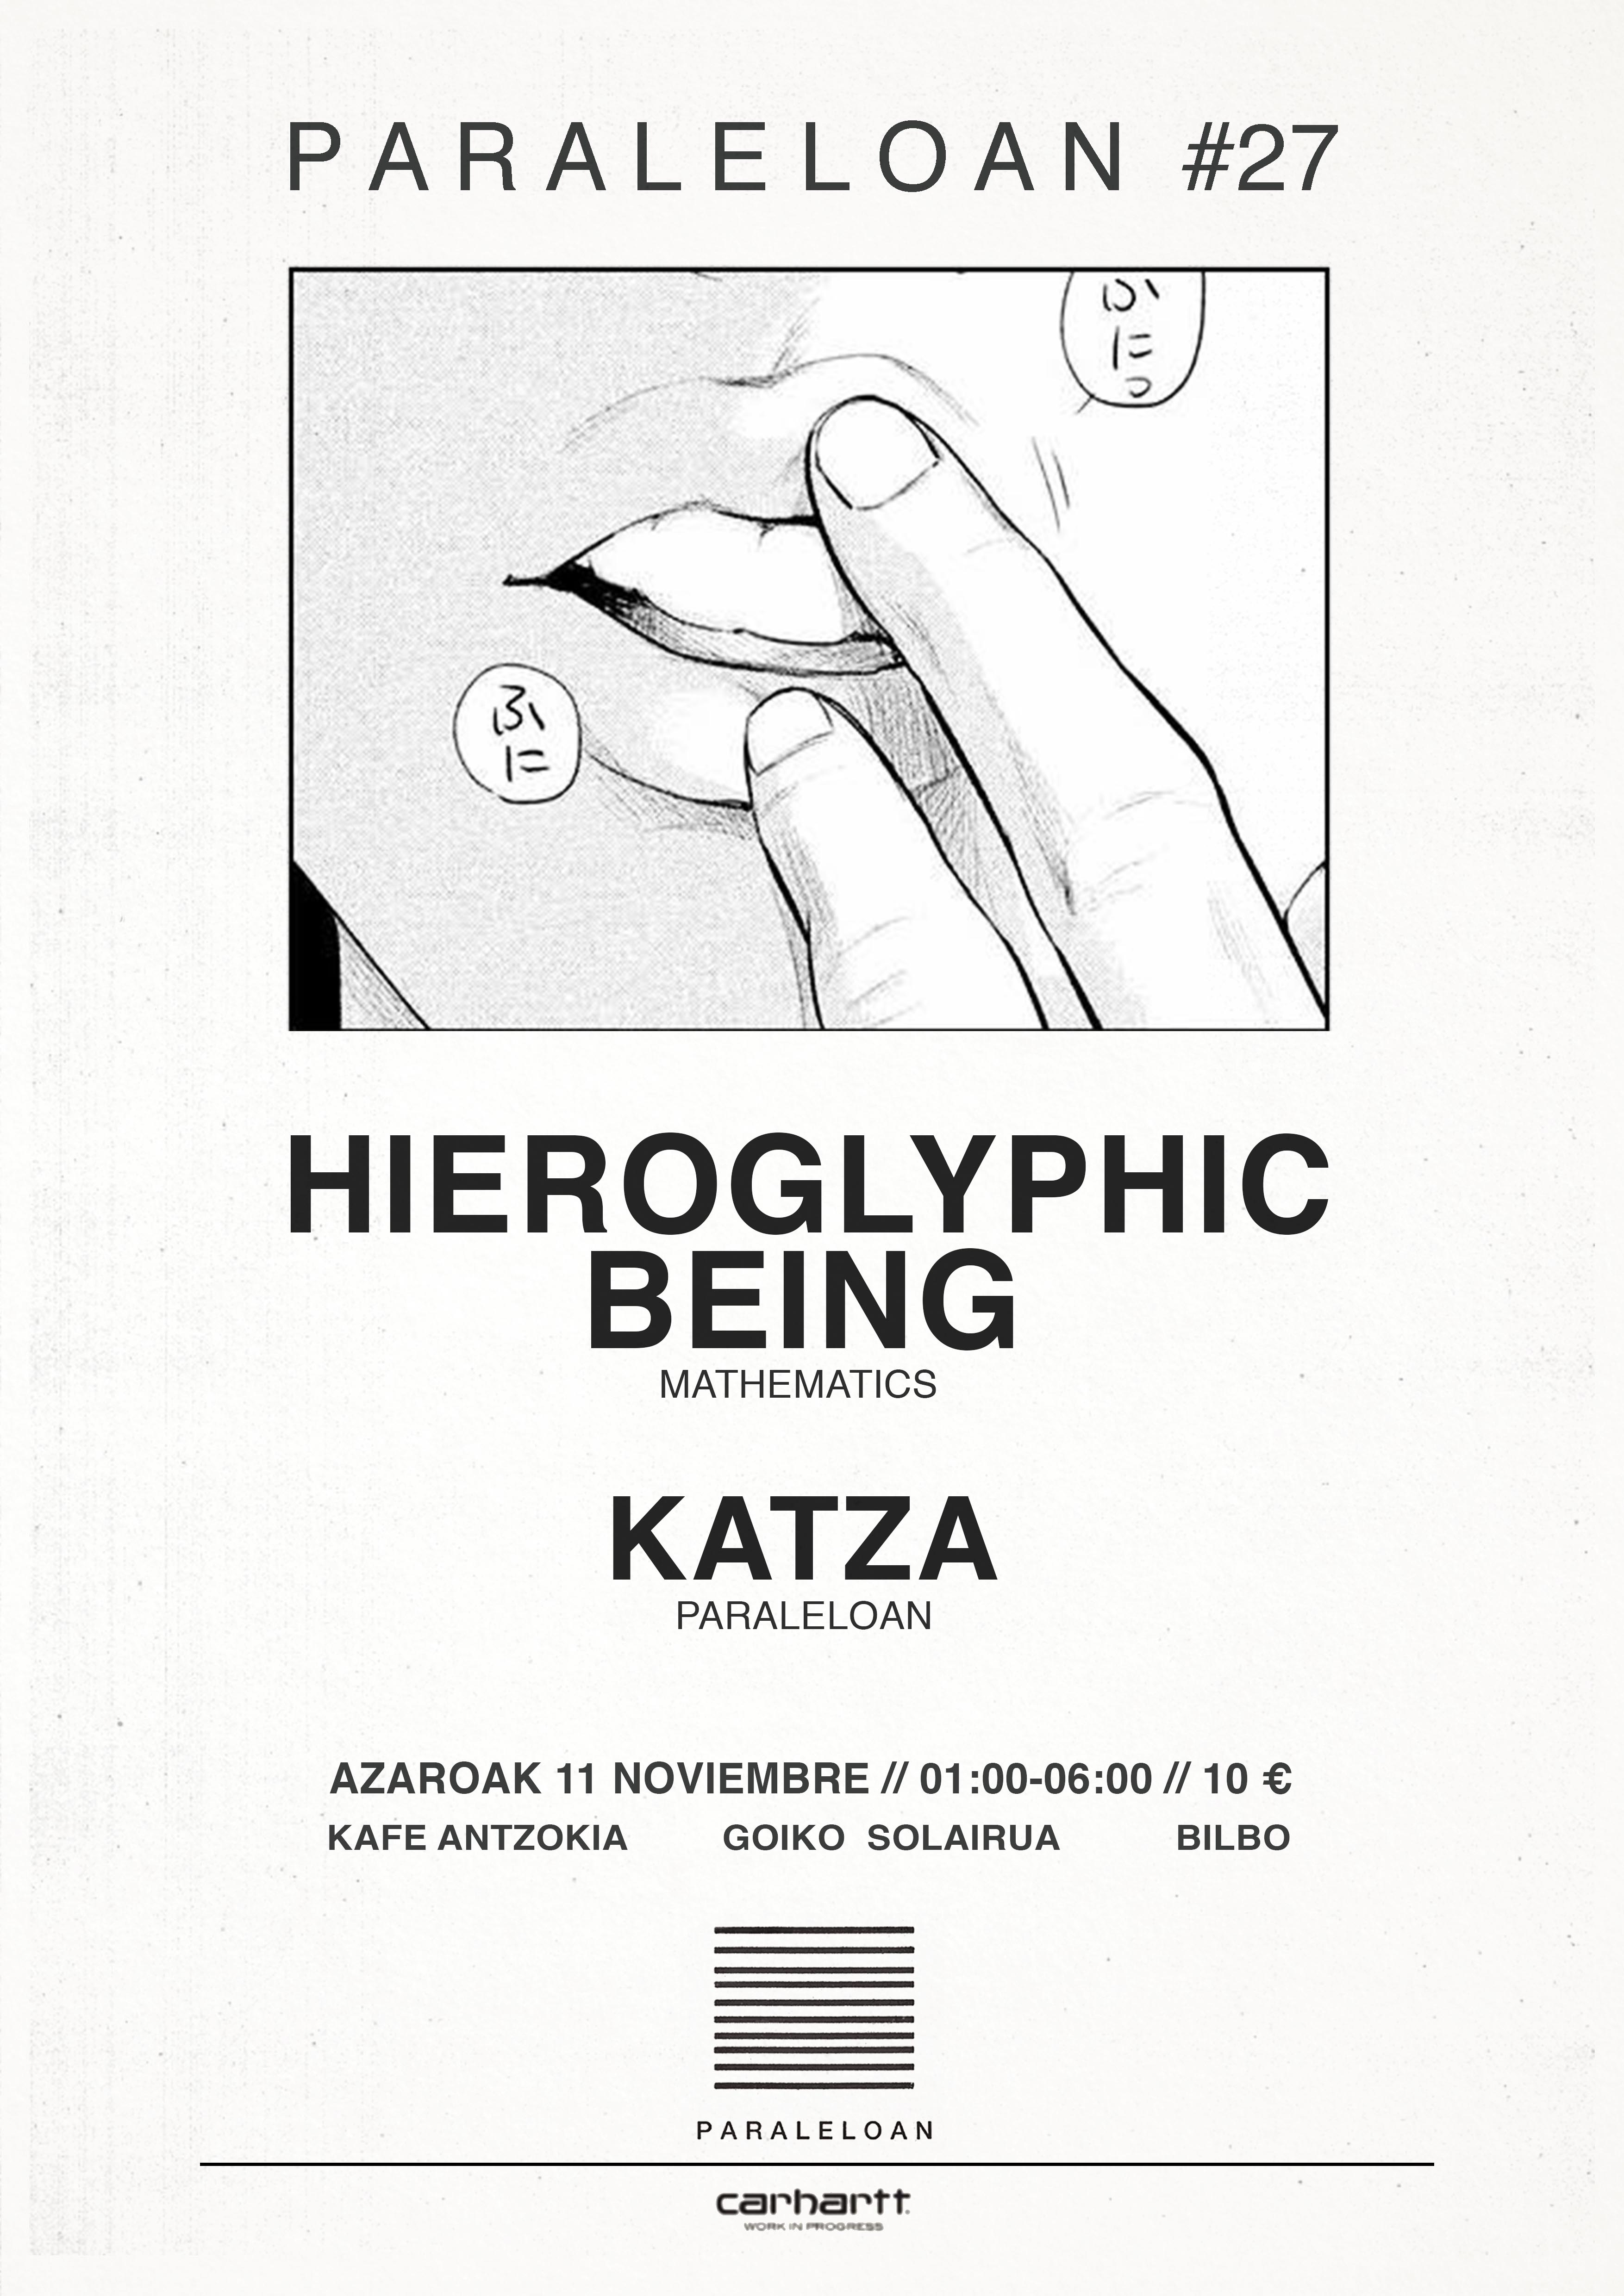 PARALELOAN #27 - HIEROGLYPHIC BEING // KATZA